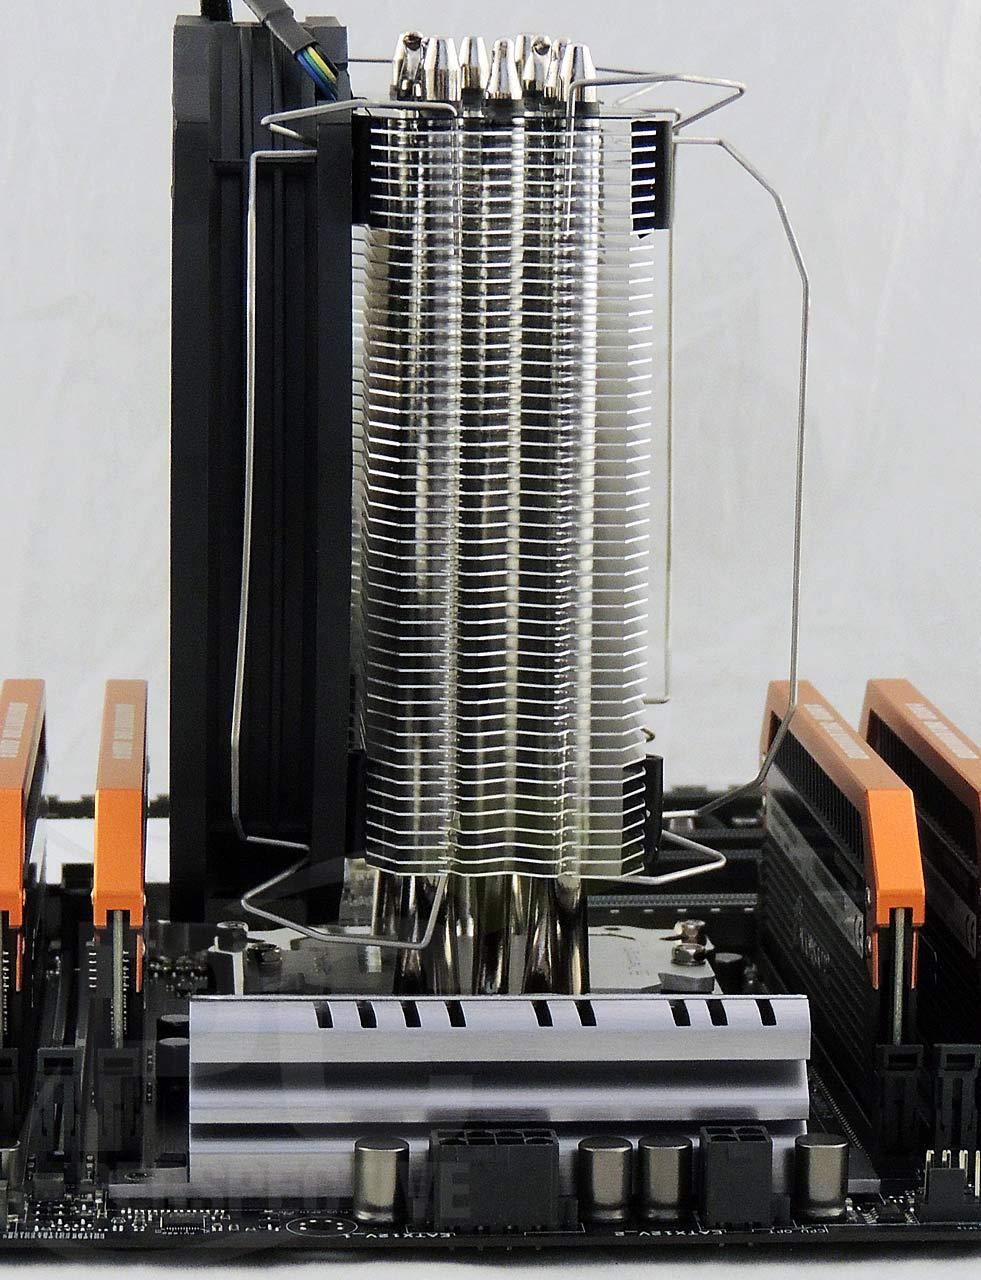 14-board-cooler-x99-right.jpg